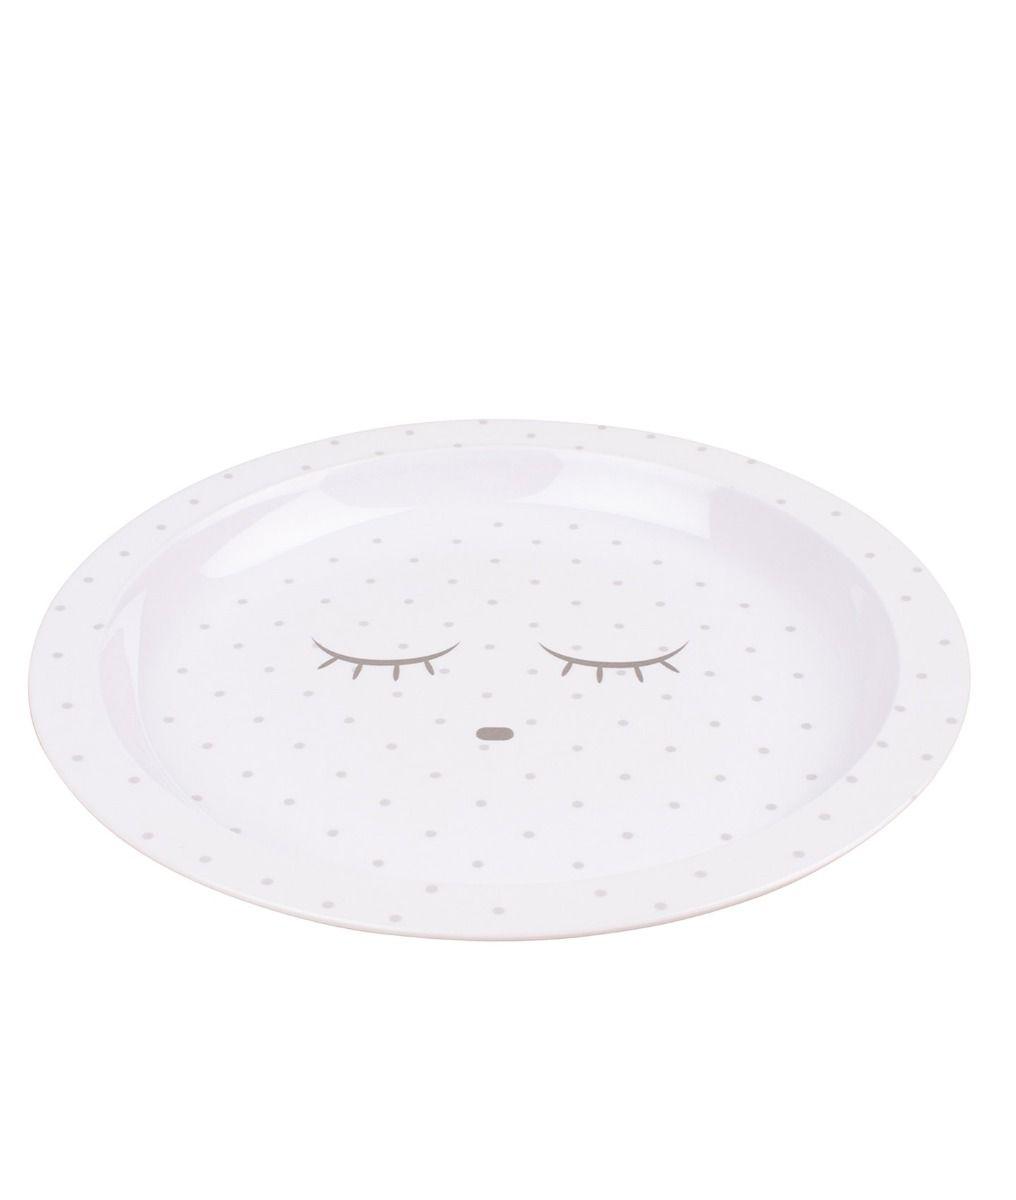 Livly Plate White